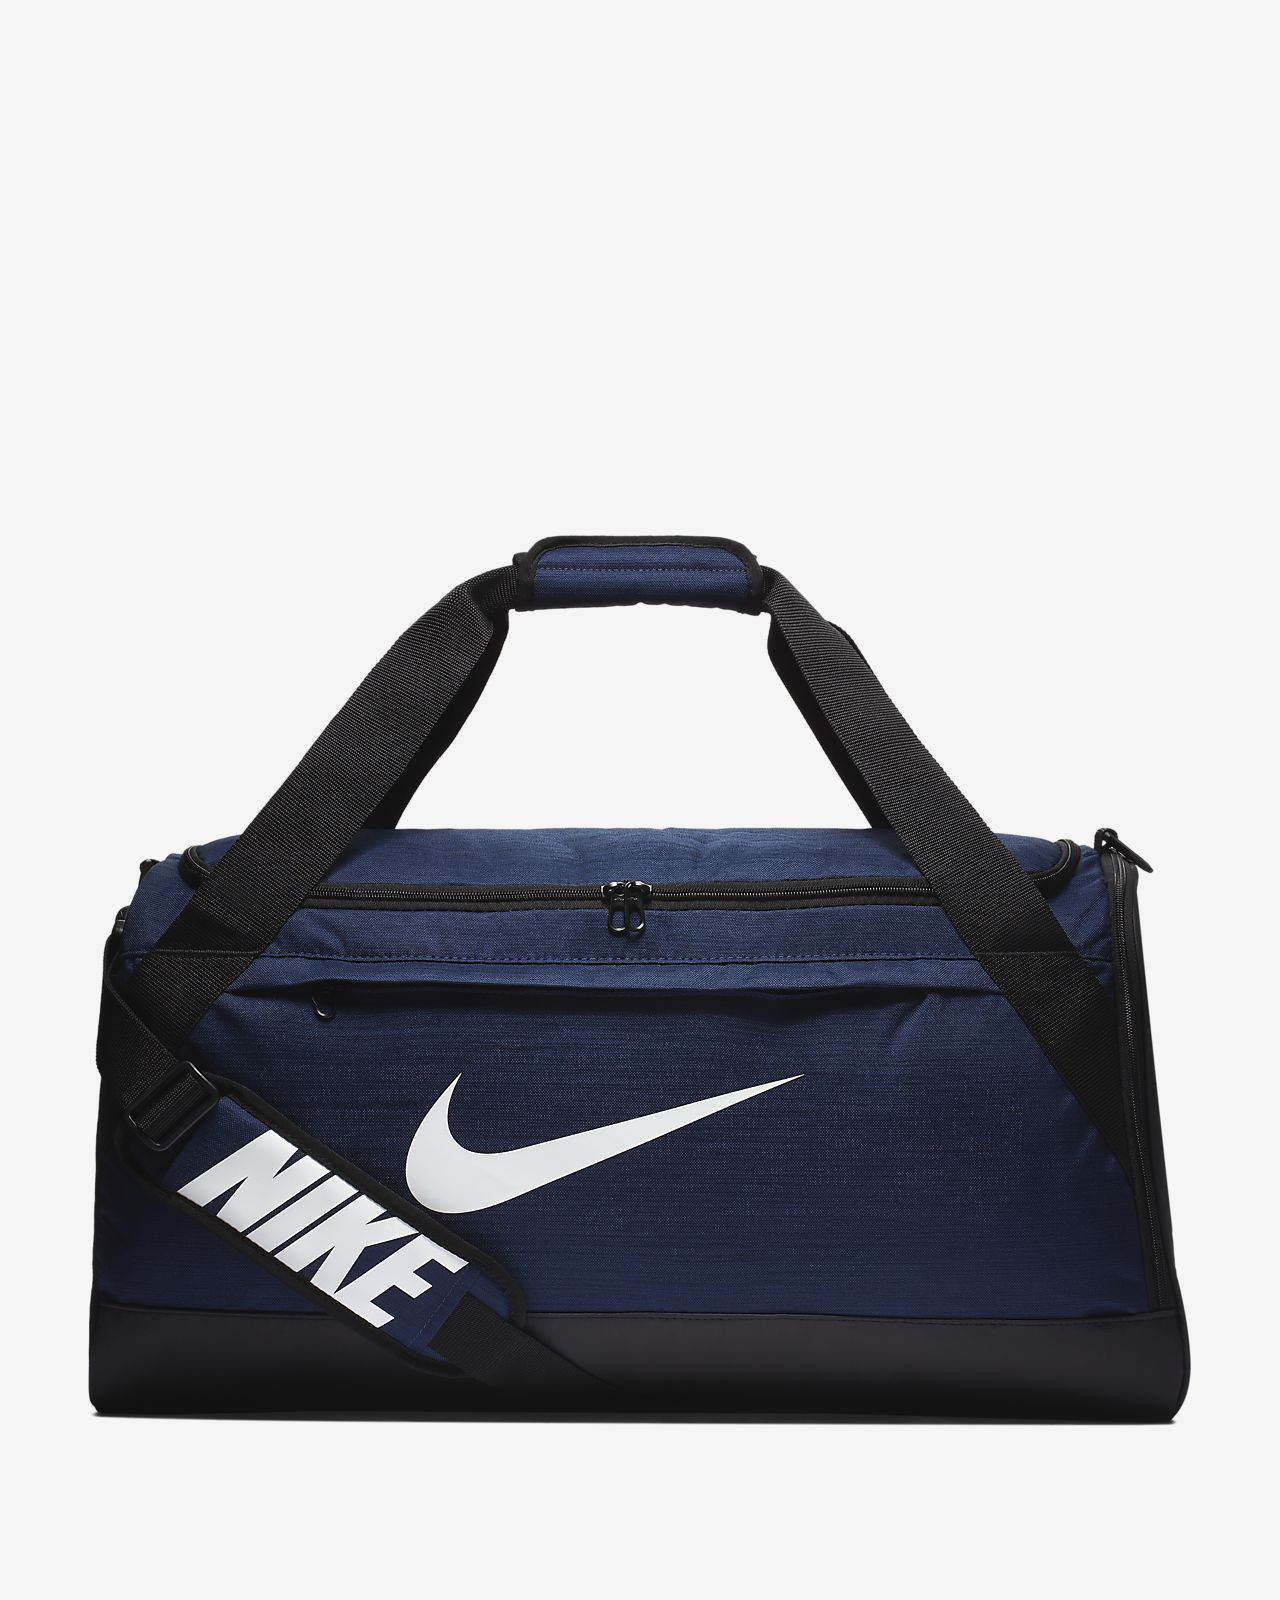 Nike Brasilia Training Duffel Bag (Medium). Nike.com 00130a972a